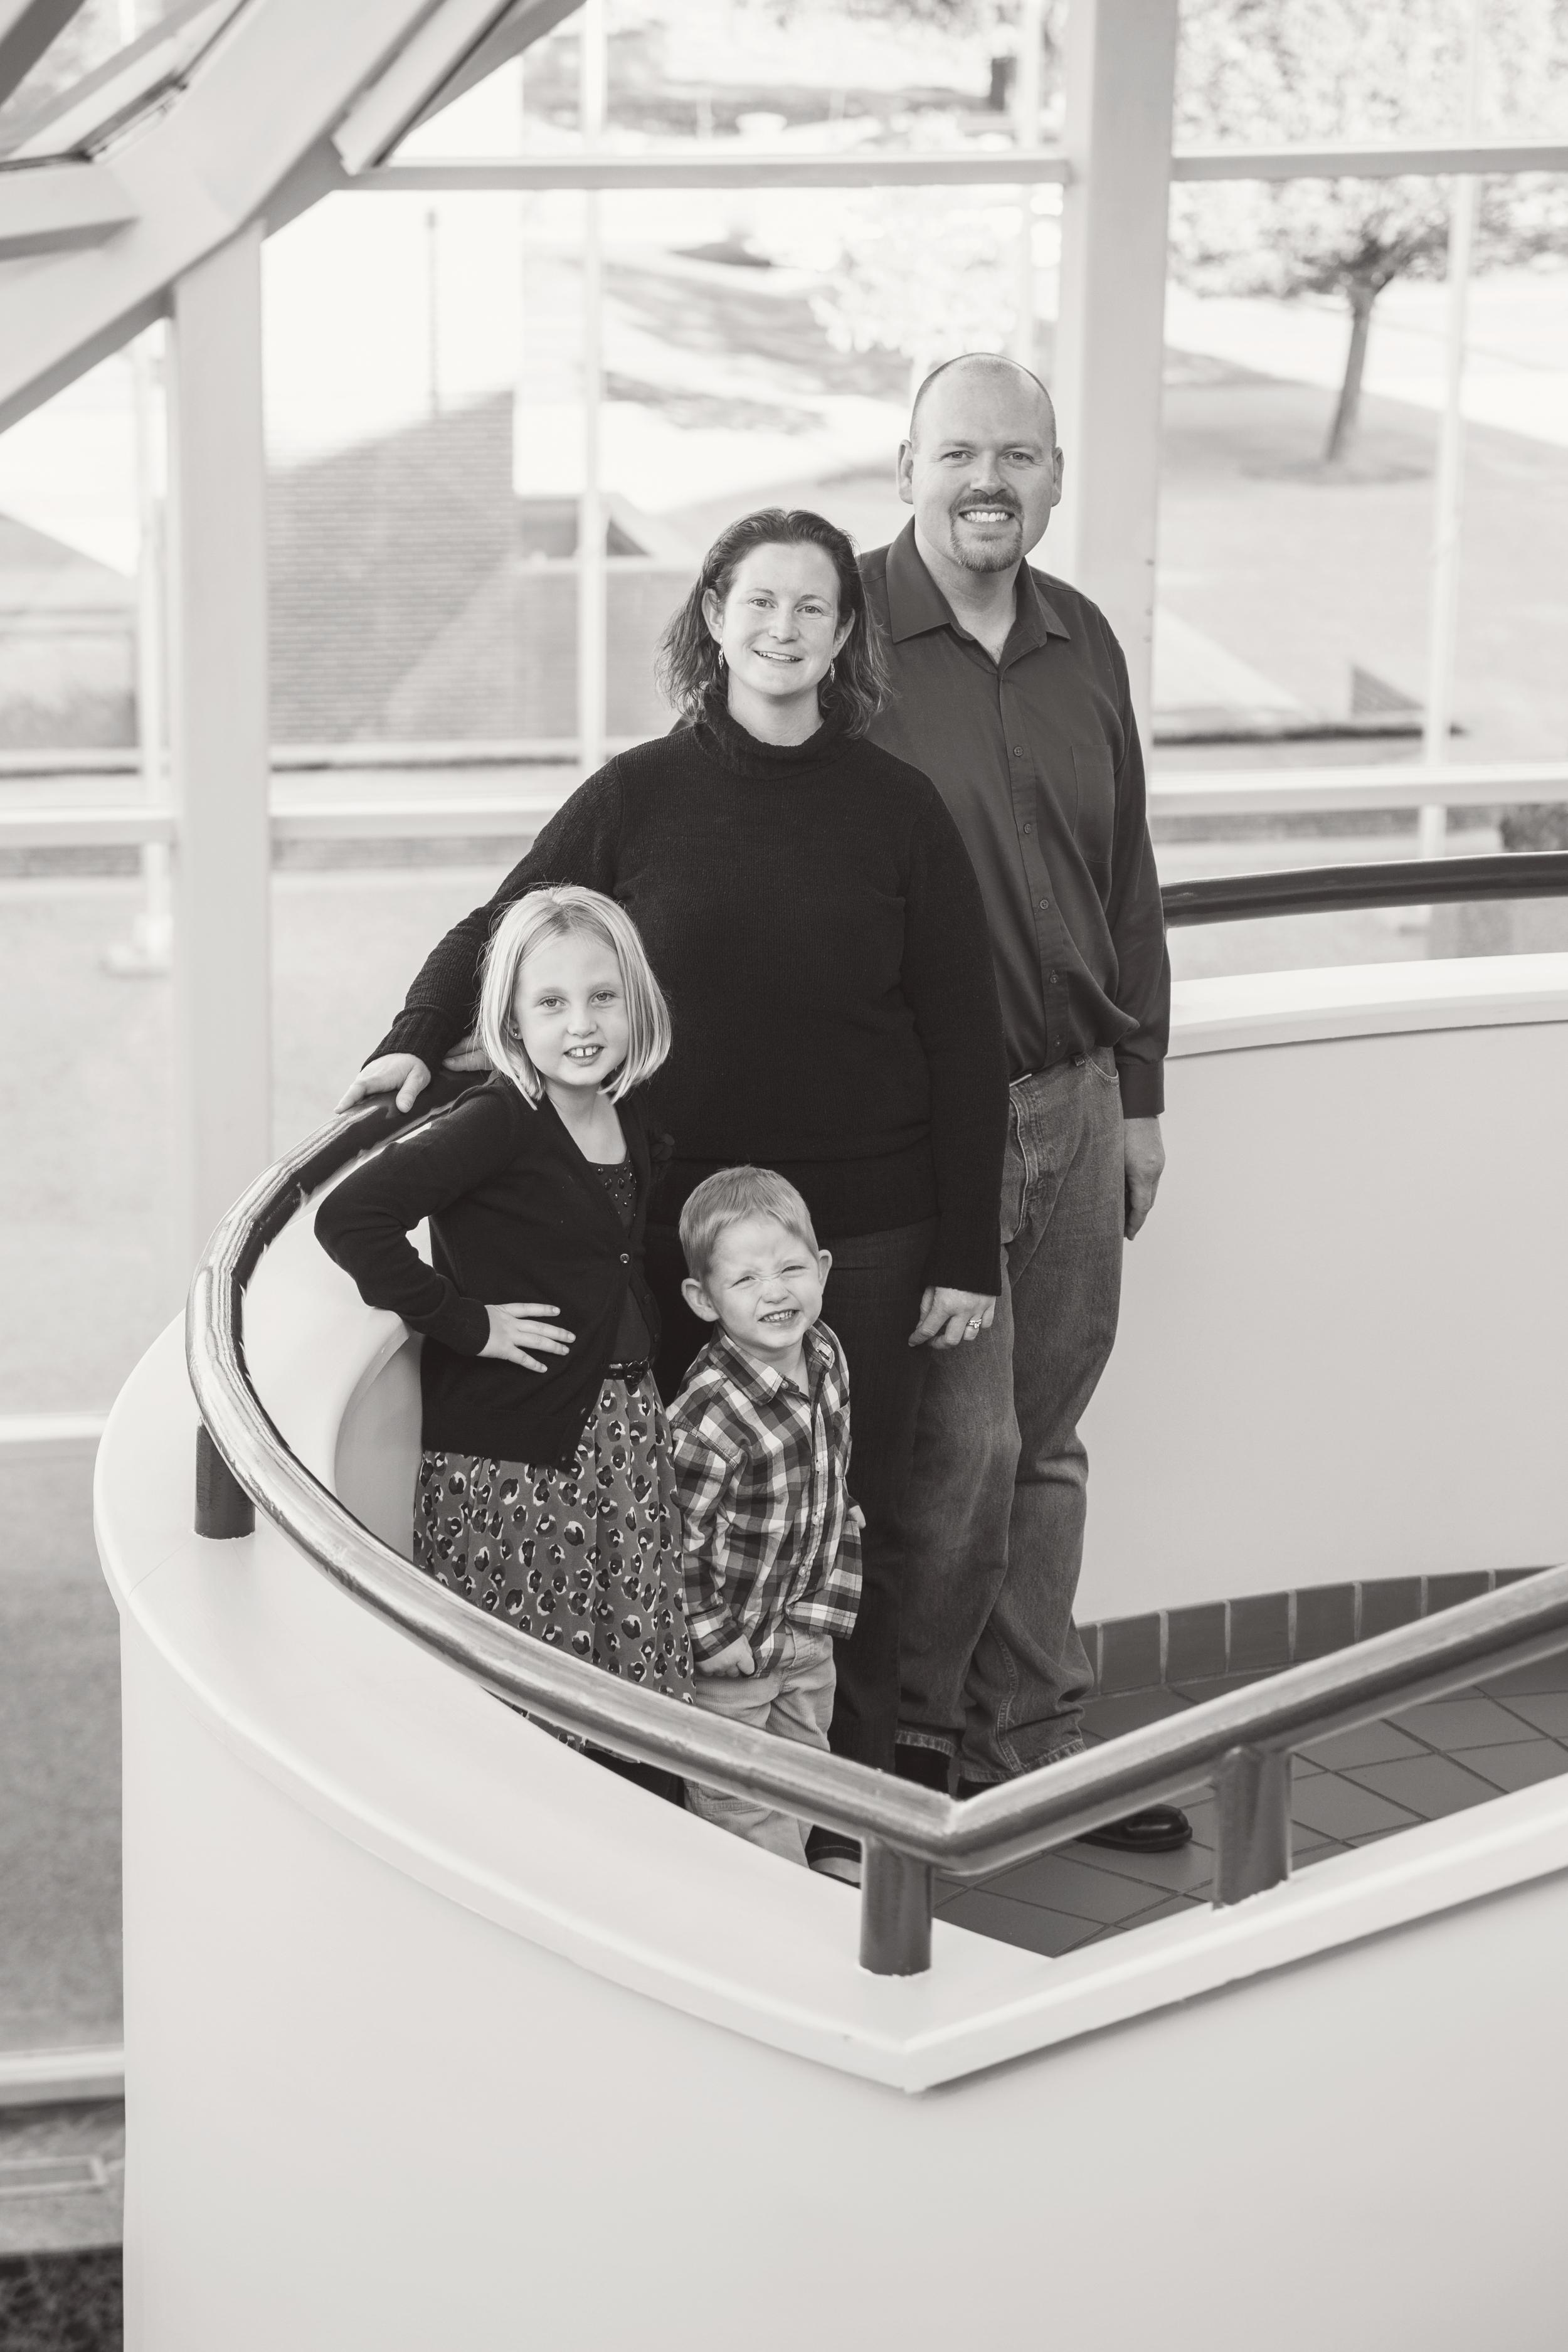 Family_Photos_2014_009_bw.jpg